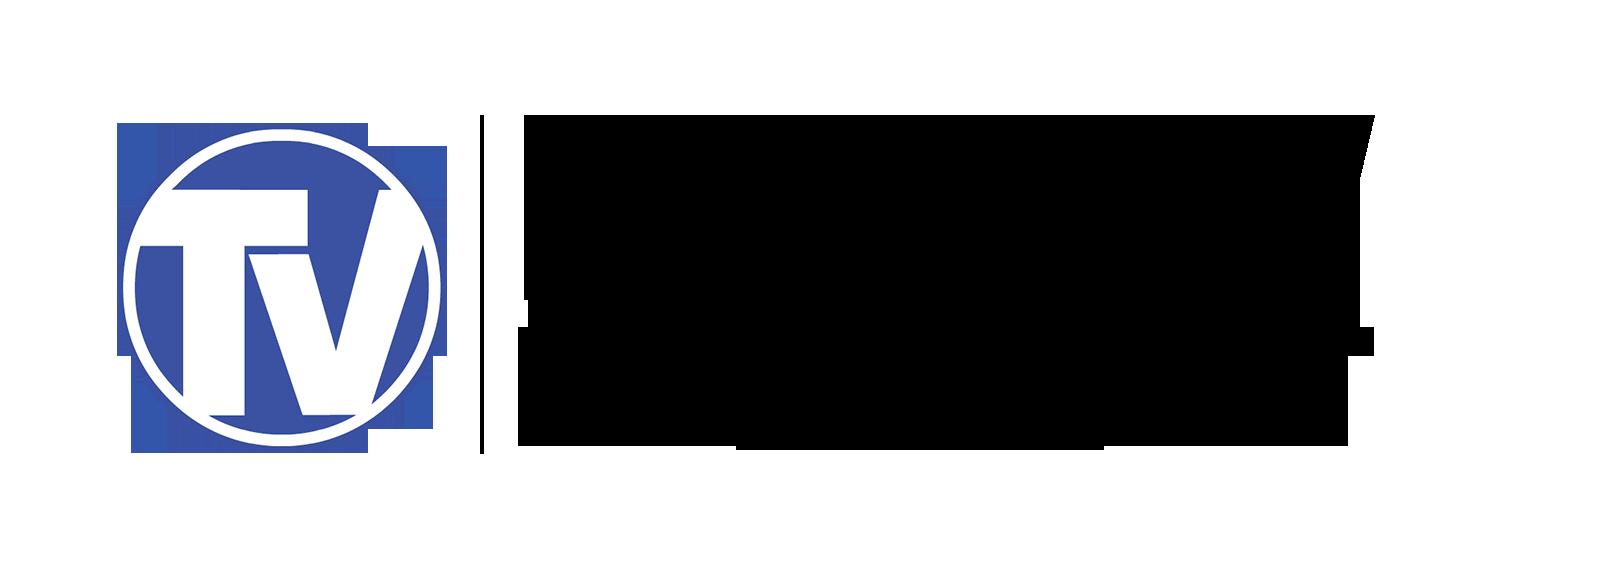 Diy Network Logo Png